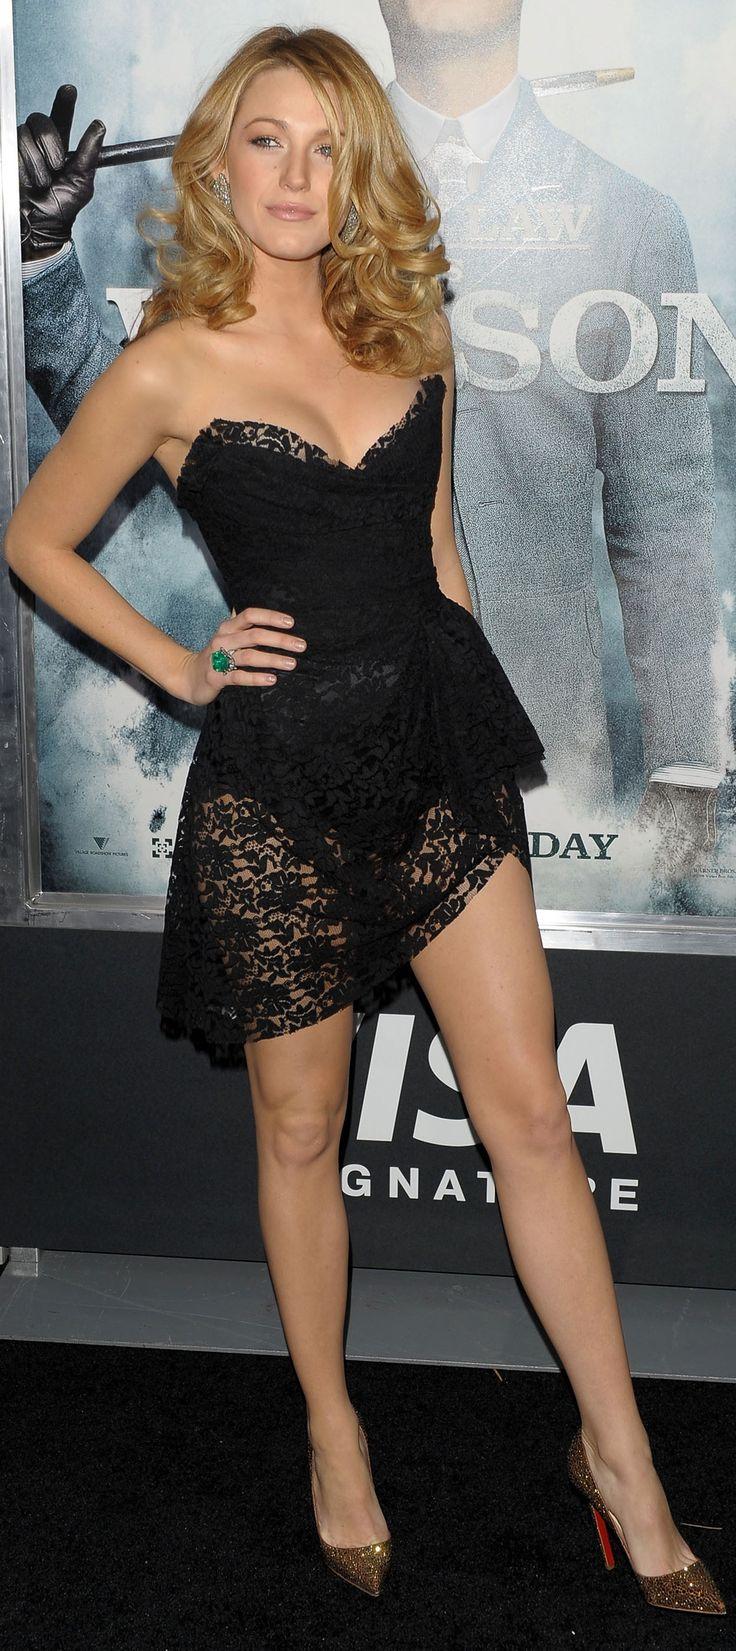 Essence Atkins Boobs regarding 219 best beauty&famous&favourite images on pinterest | actresses